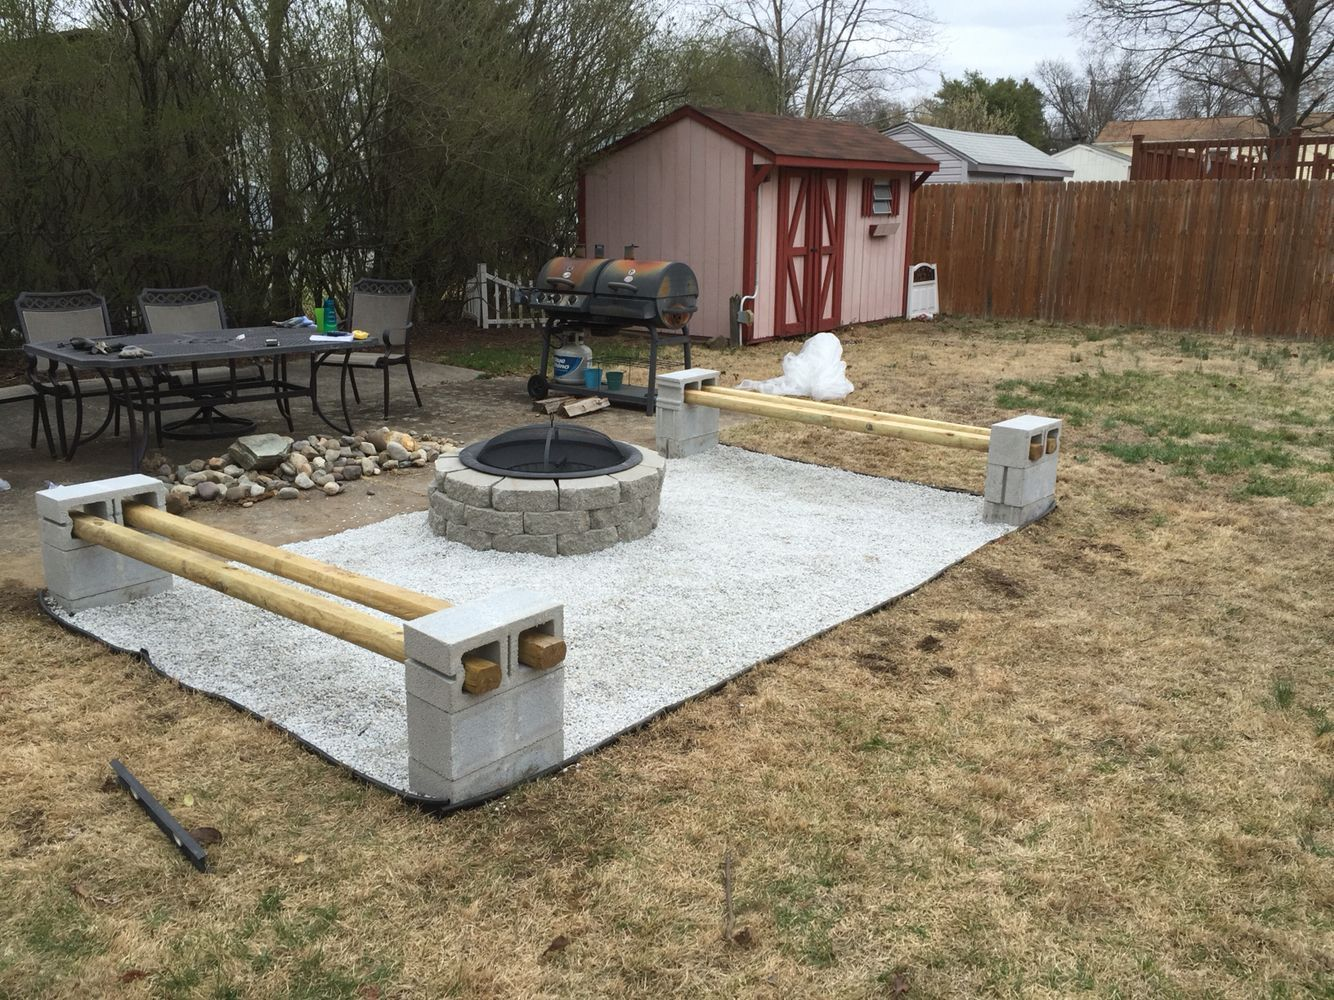 Diy Fire Pit Gravel Flooring With Cinder Block Benches Backyardbenchcinderblocks Fire Pit Backyard Fire Pit Landscaping Backyard Fire